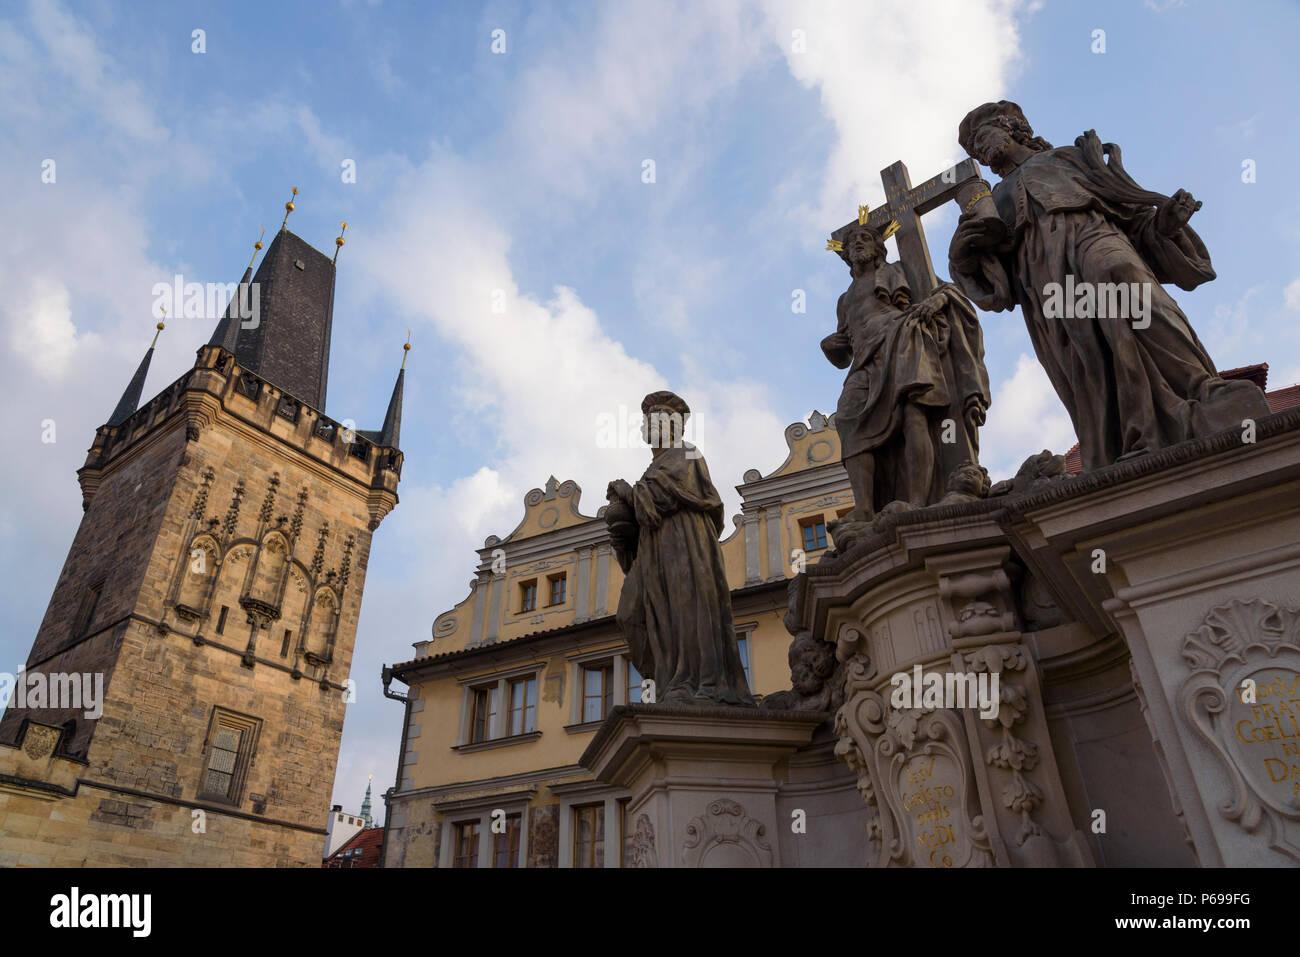 St. Cosmas and Damian statue on the Charles Bridge. Mostecka/Lesser Bridge tower in Mala Strana, Prague, Czech Republic - Stock Image